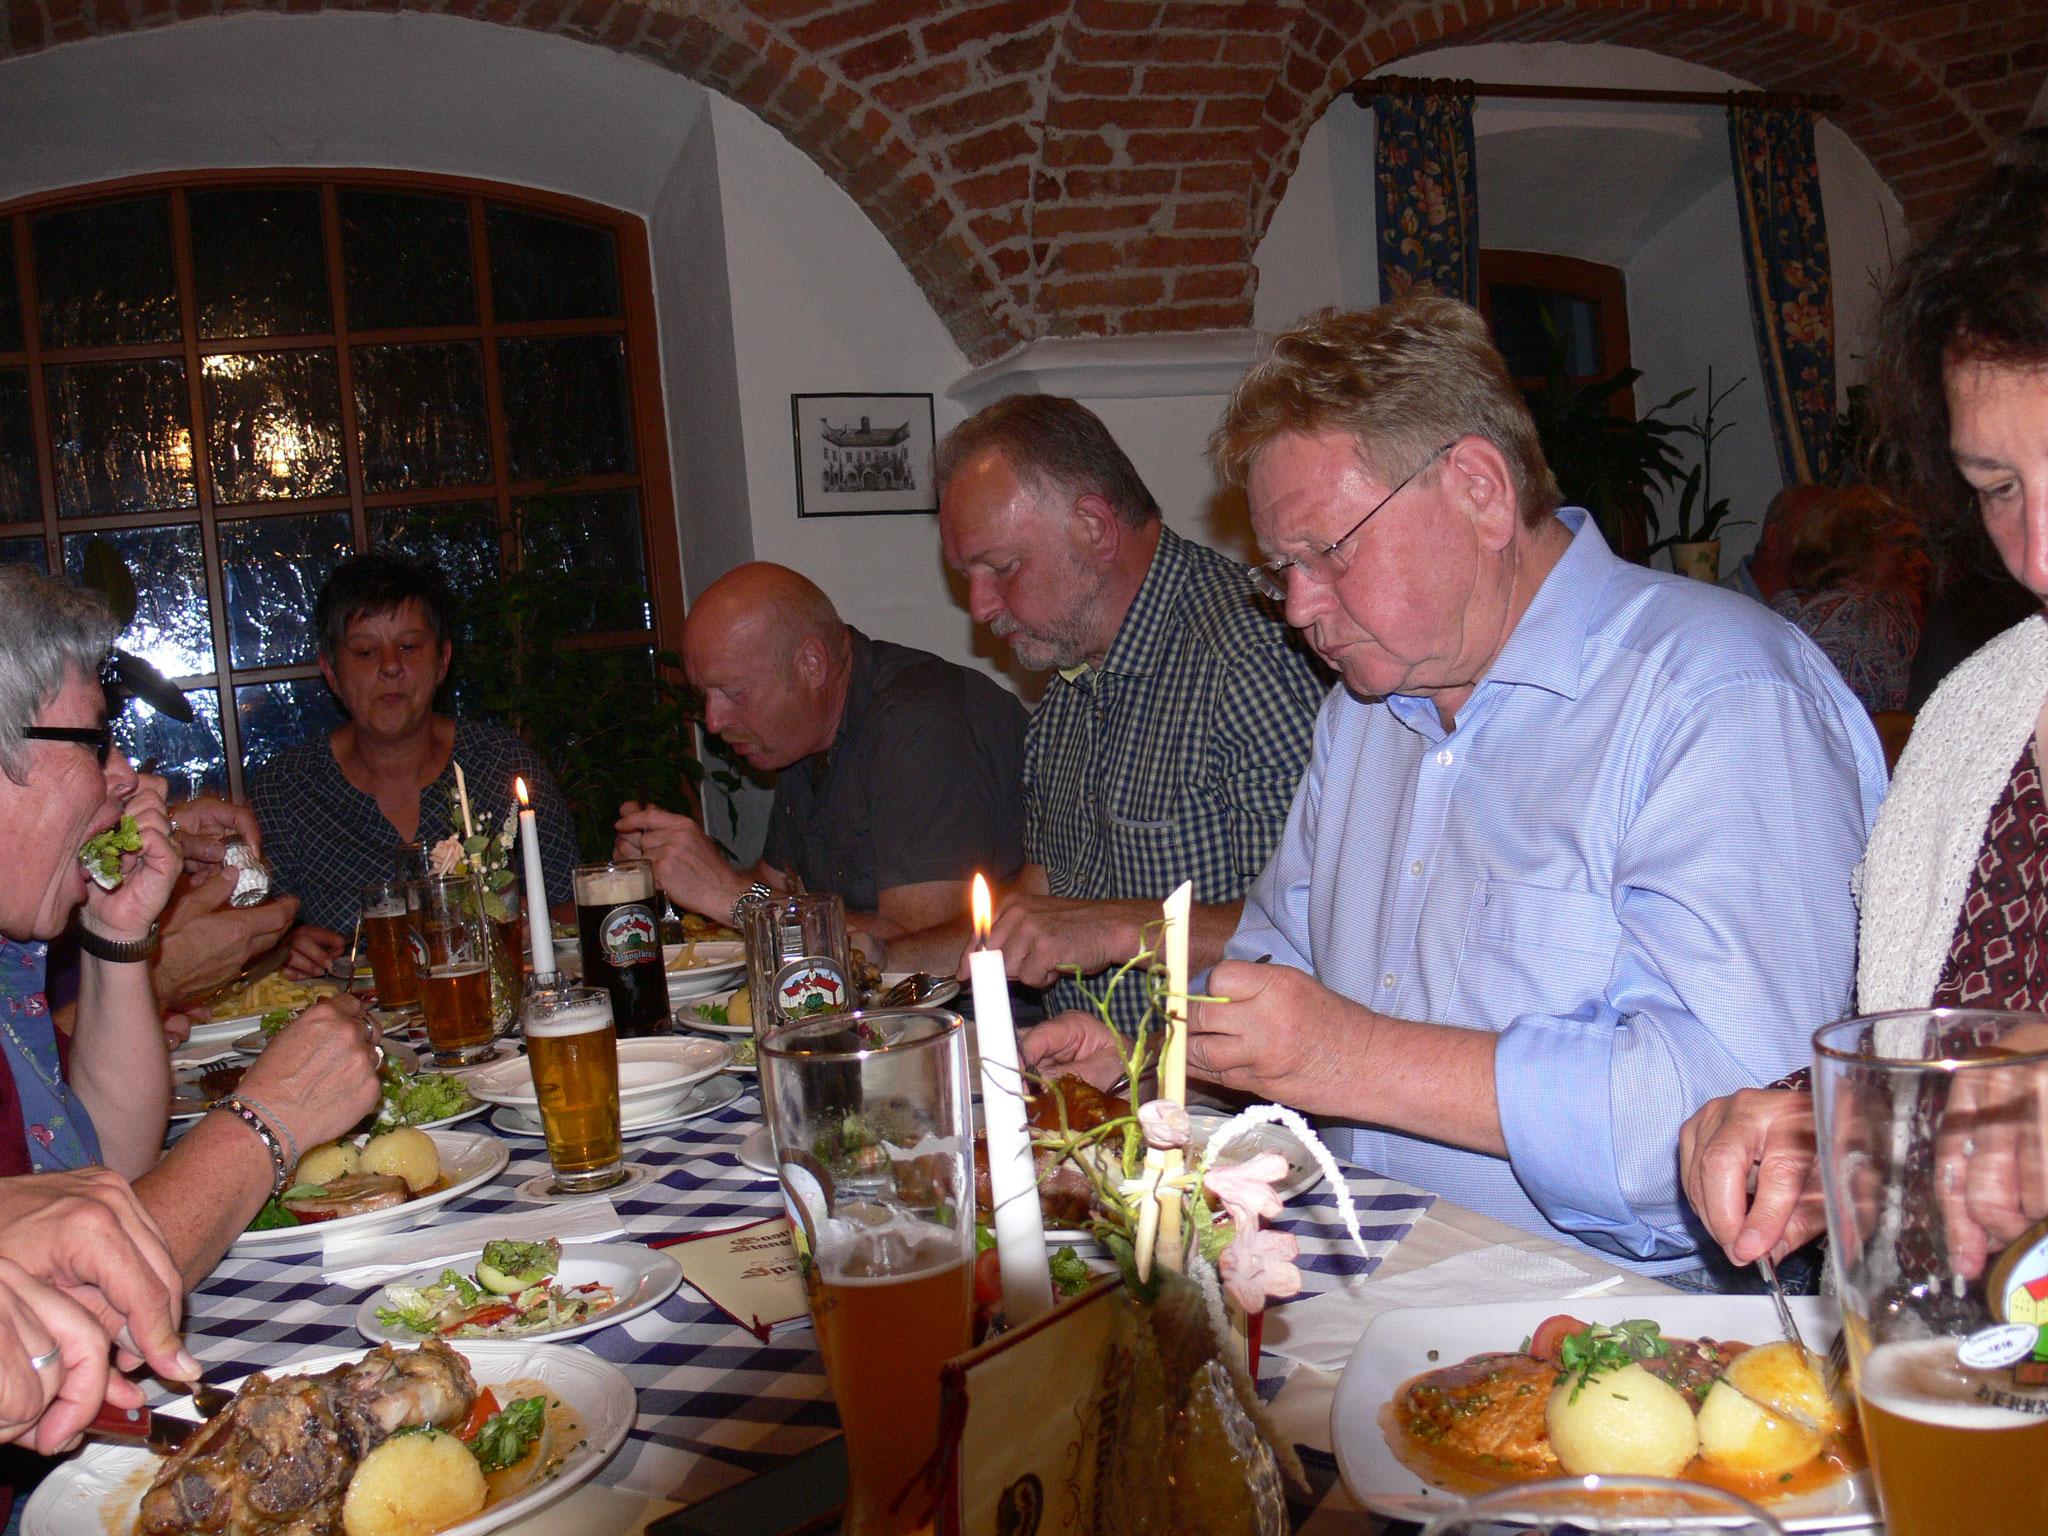 So ernährt man sich in Bayern.